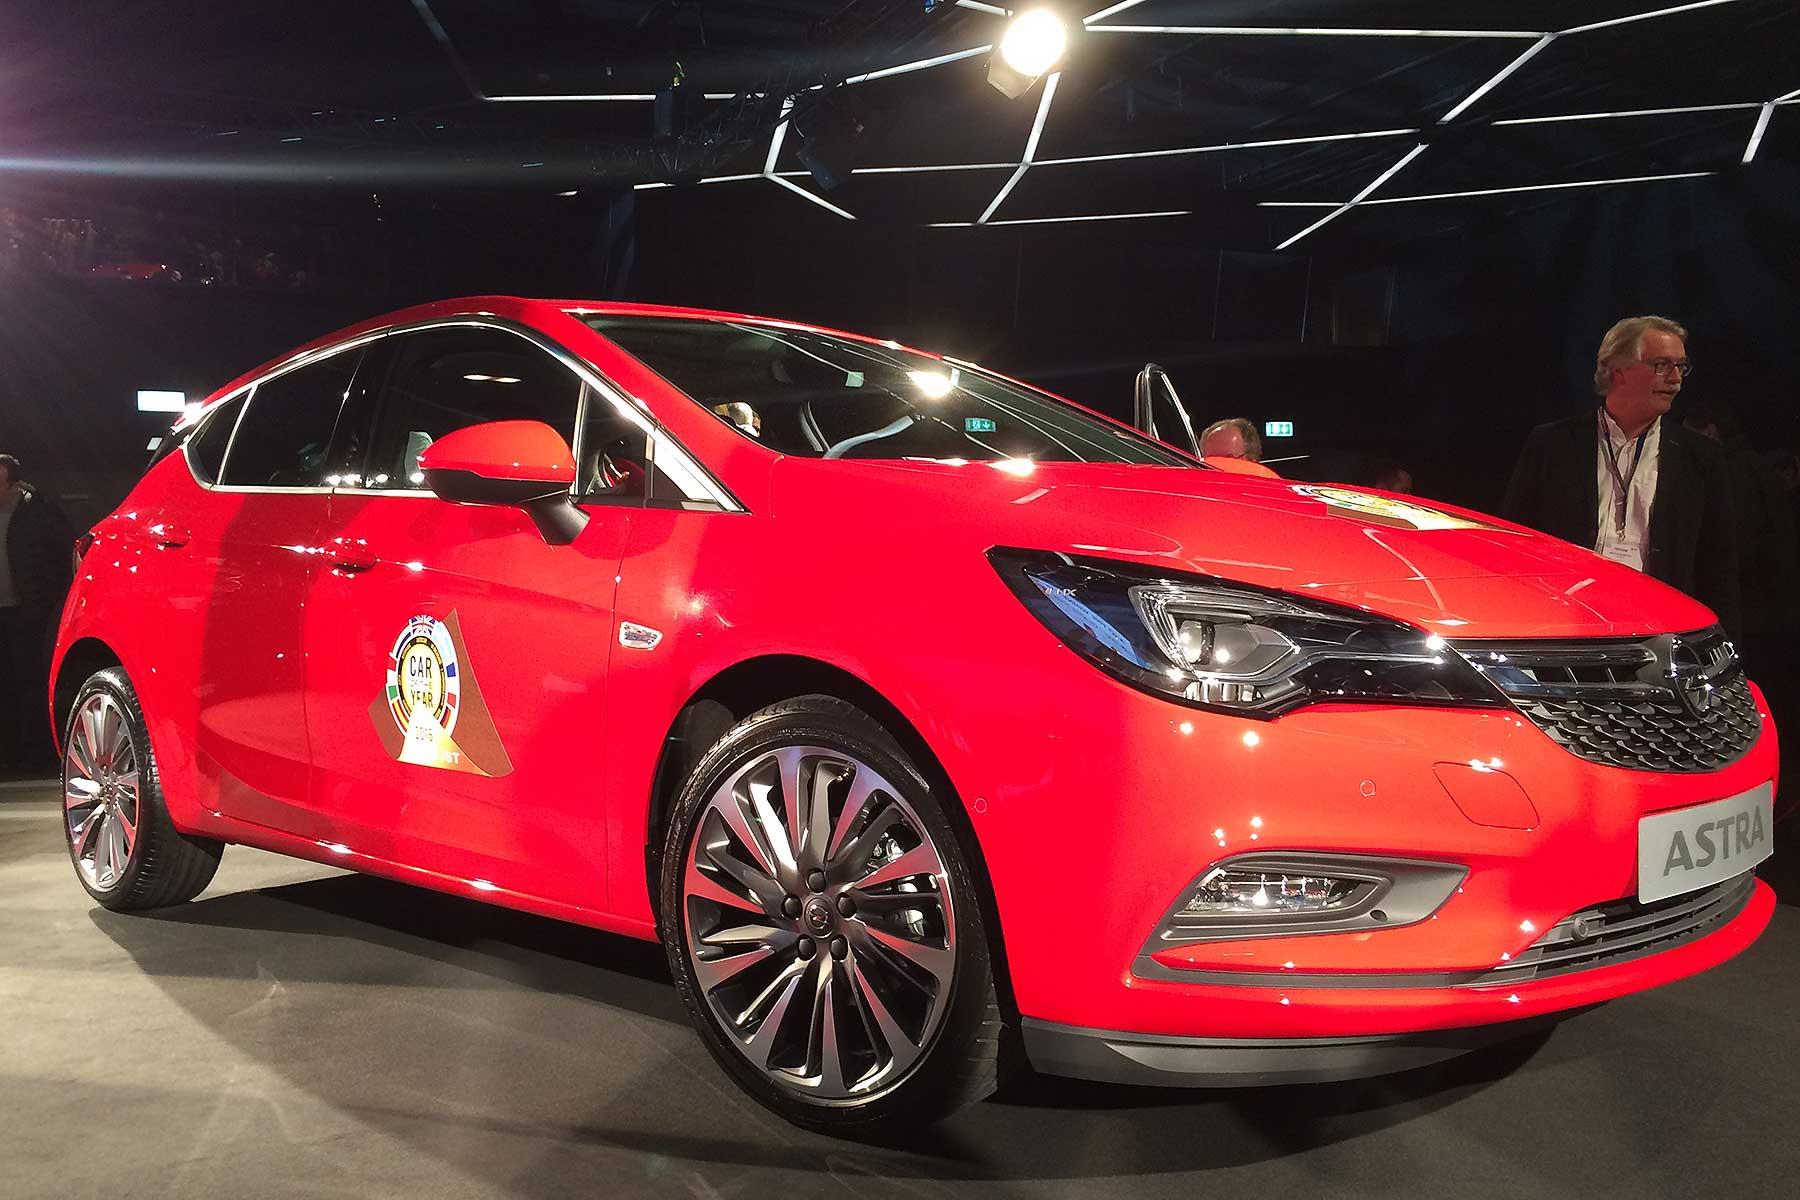 Vauxhall Astra COTY 2016